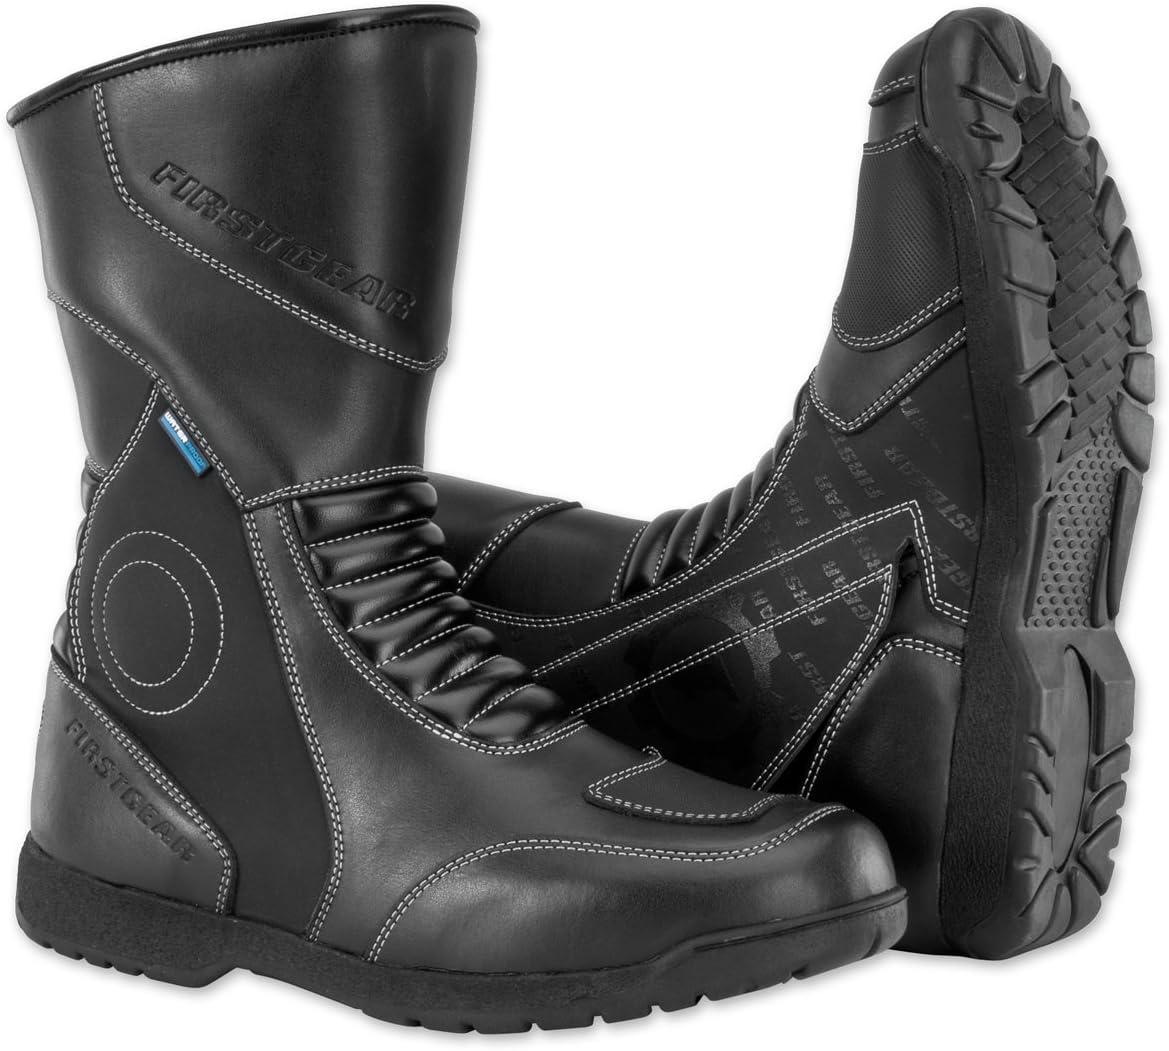 Firstgear Kilimanjaro Hi Waterproof Boots Black 13